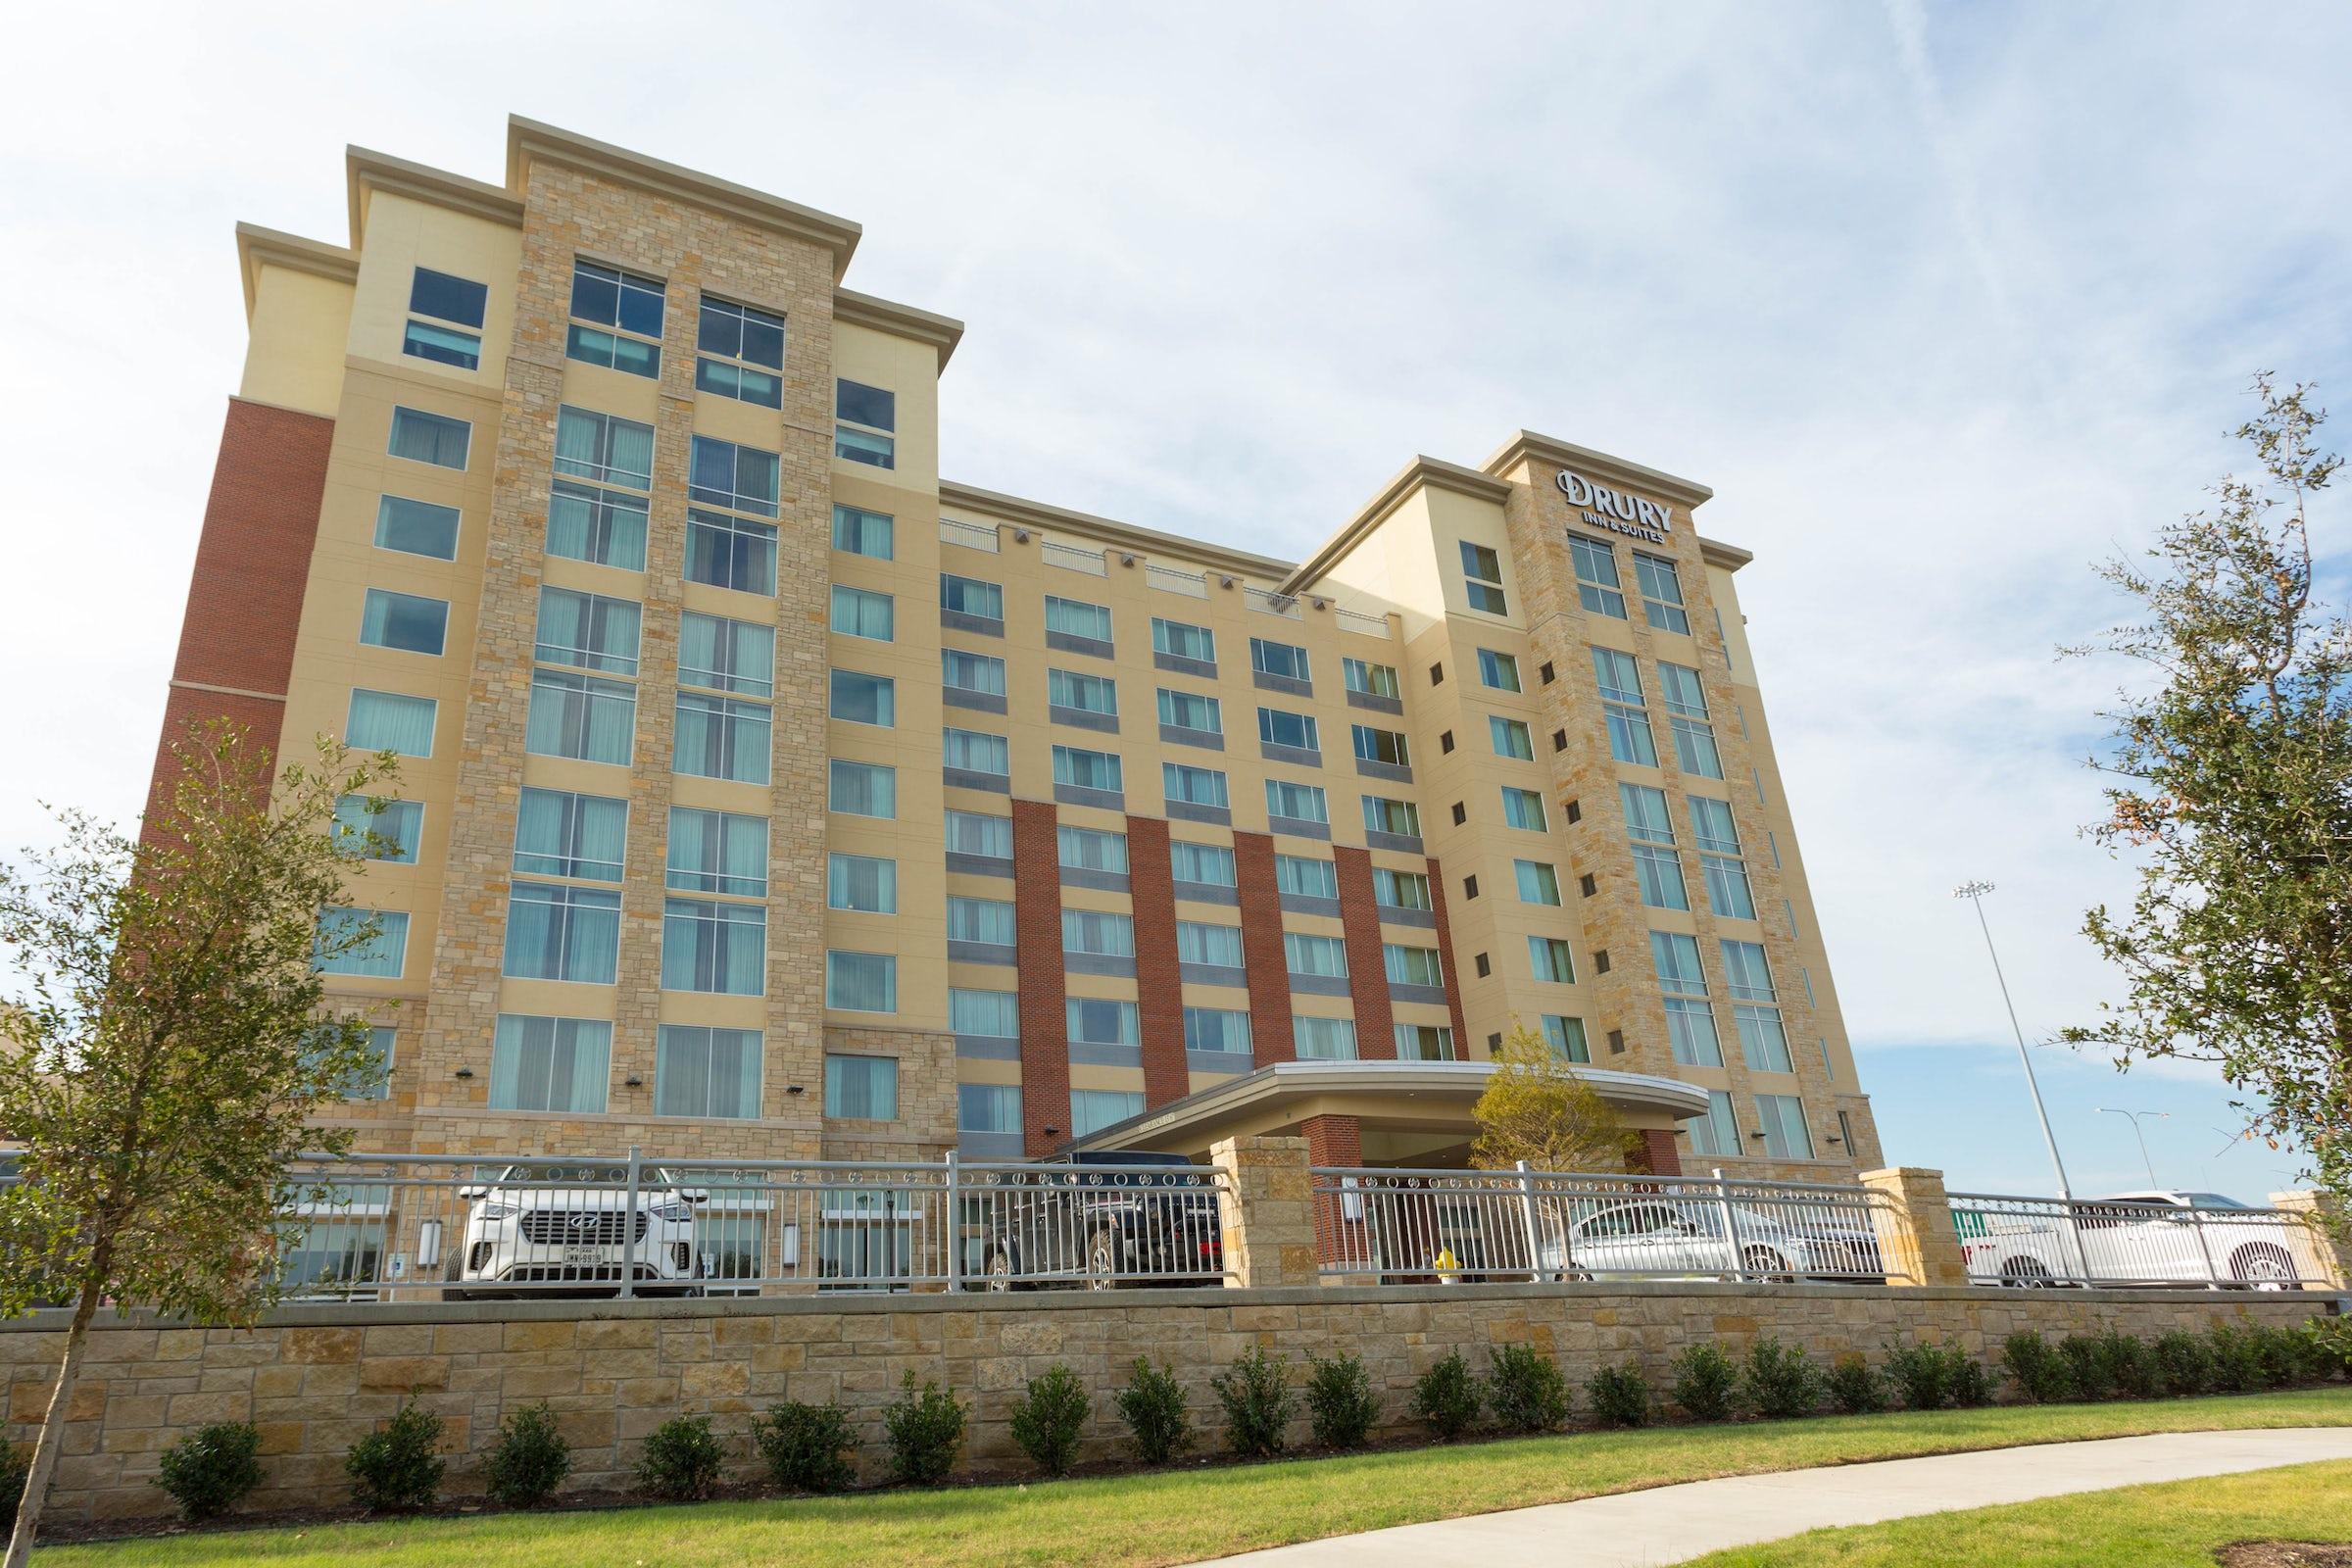 Drury Inn & Suites Frisco in Beyond Dallas